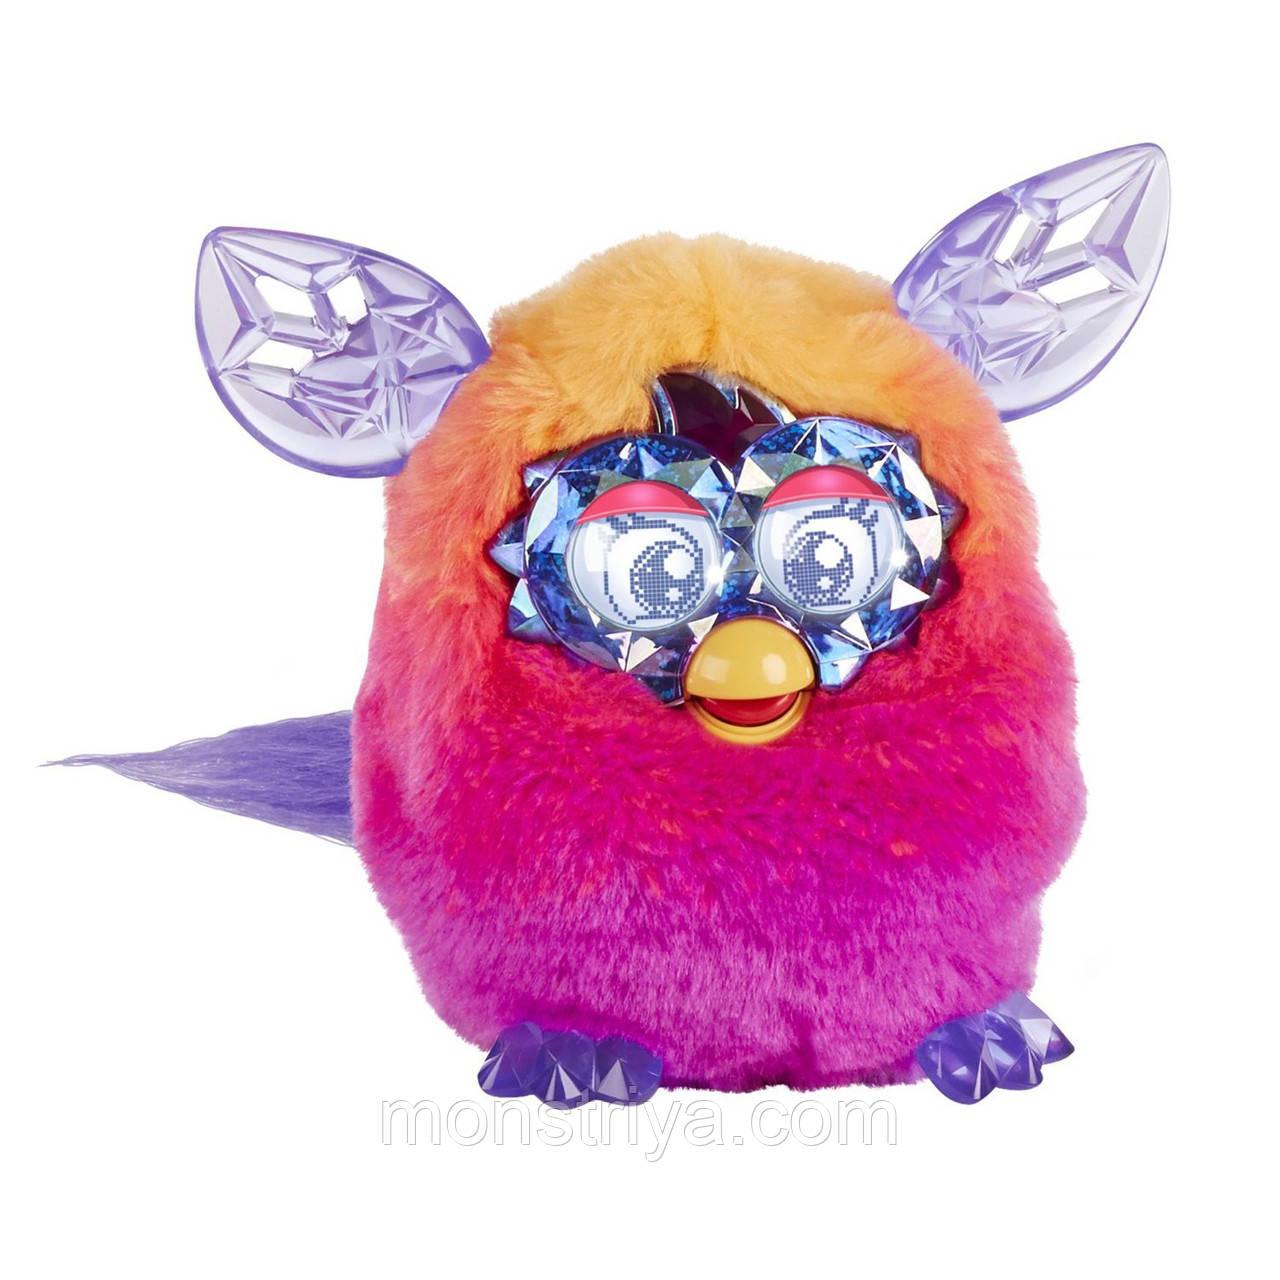 Furby Boom Crystal Series, Фёрби Кристал. Ферби Бум Интерактивная игрушка, фото 1